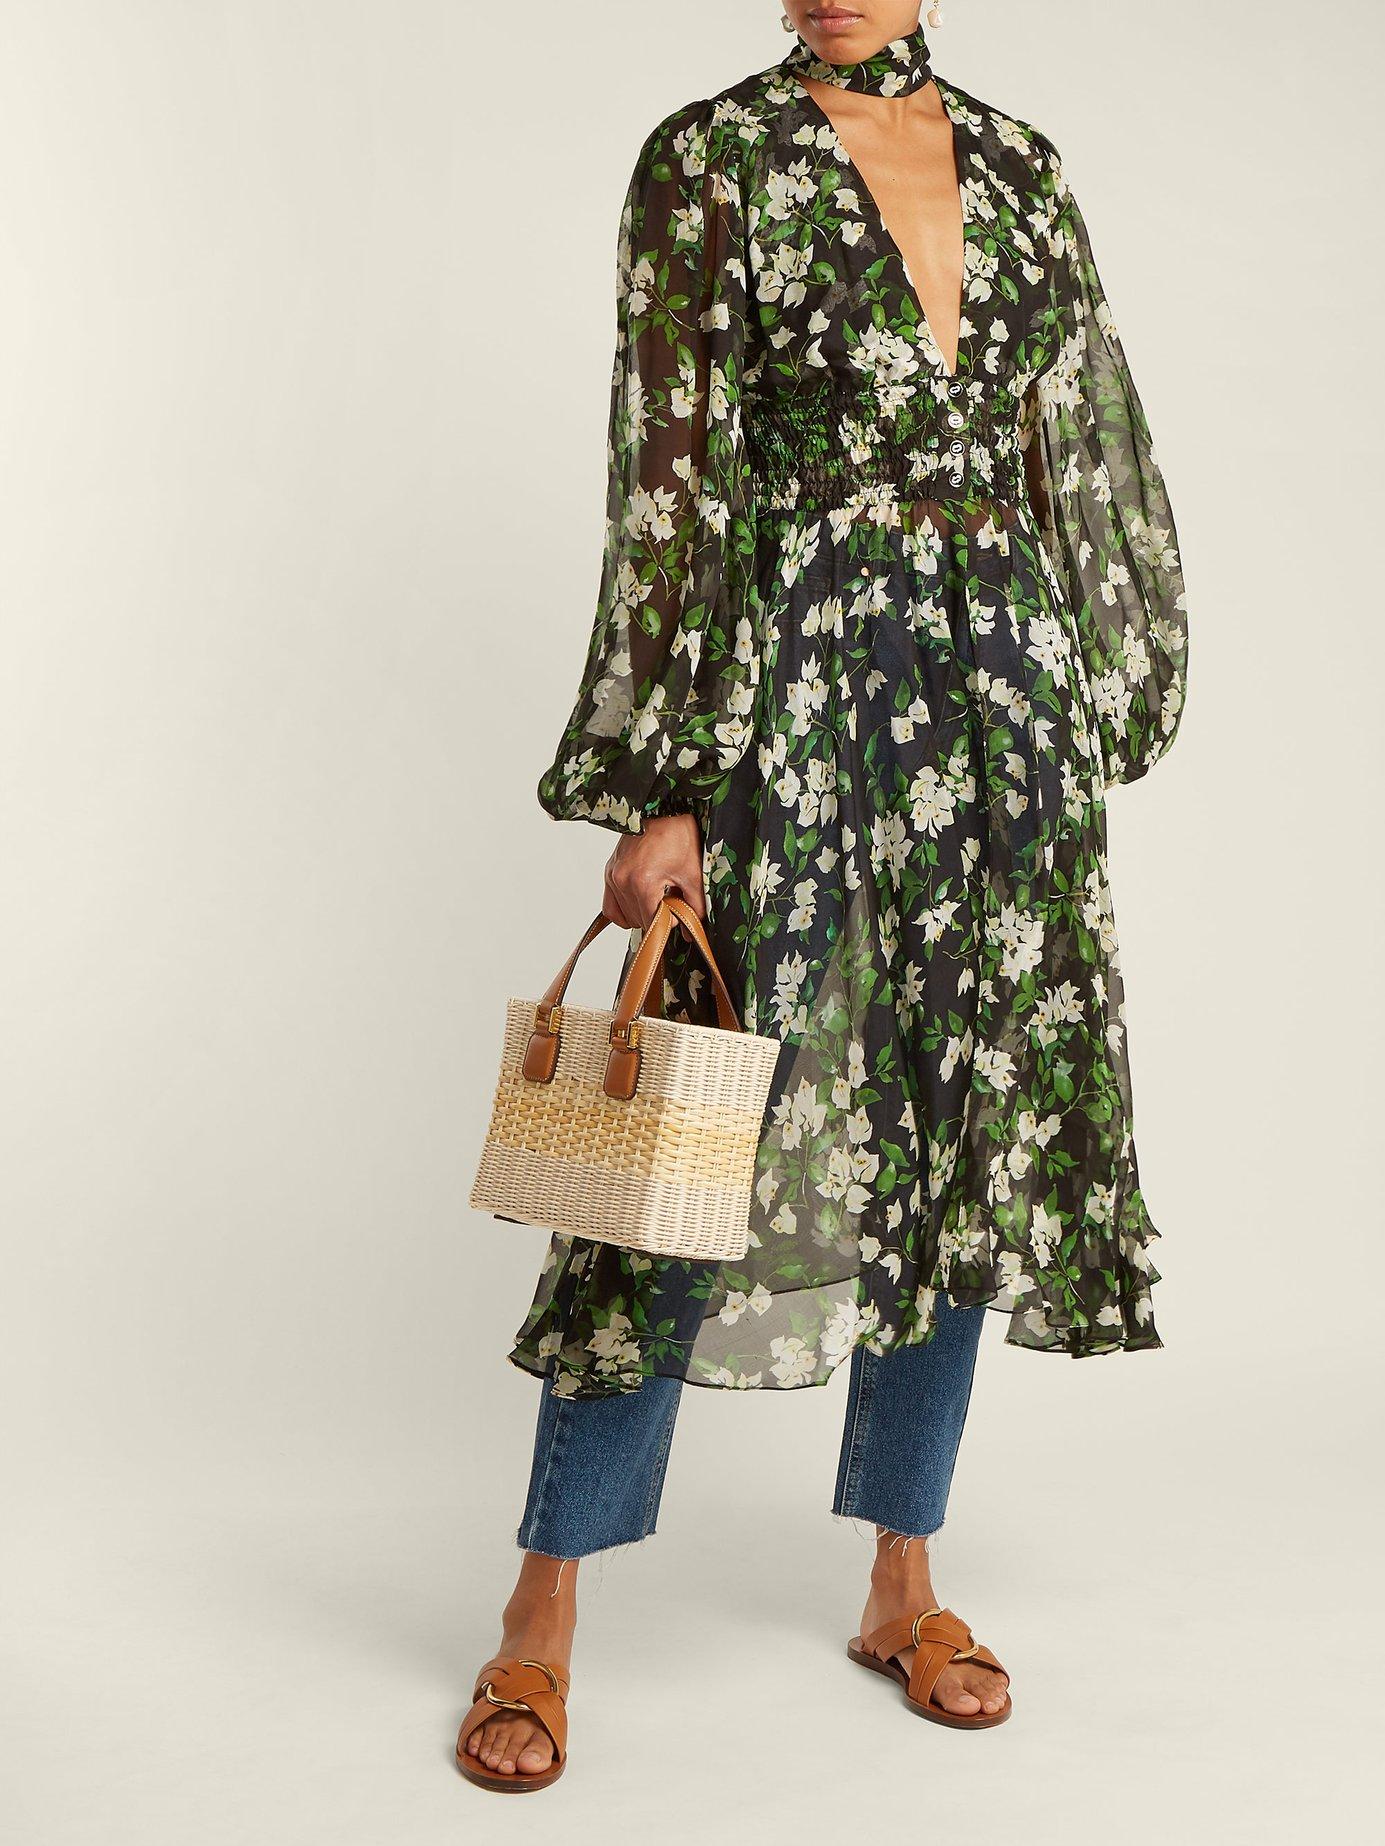 Syris floral-print silk chiffon dress by Caroline Constas